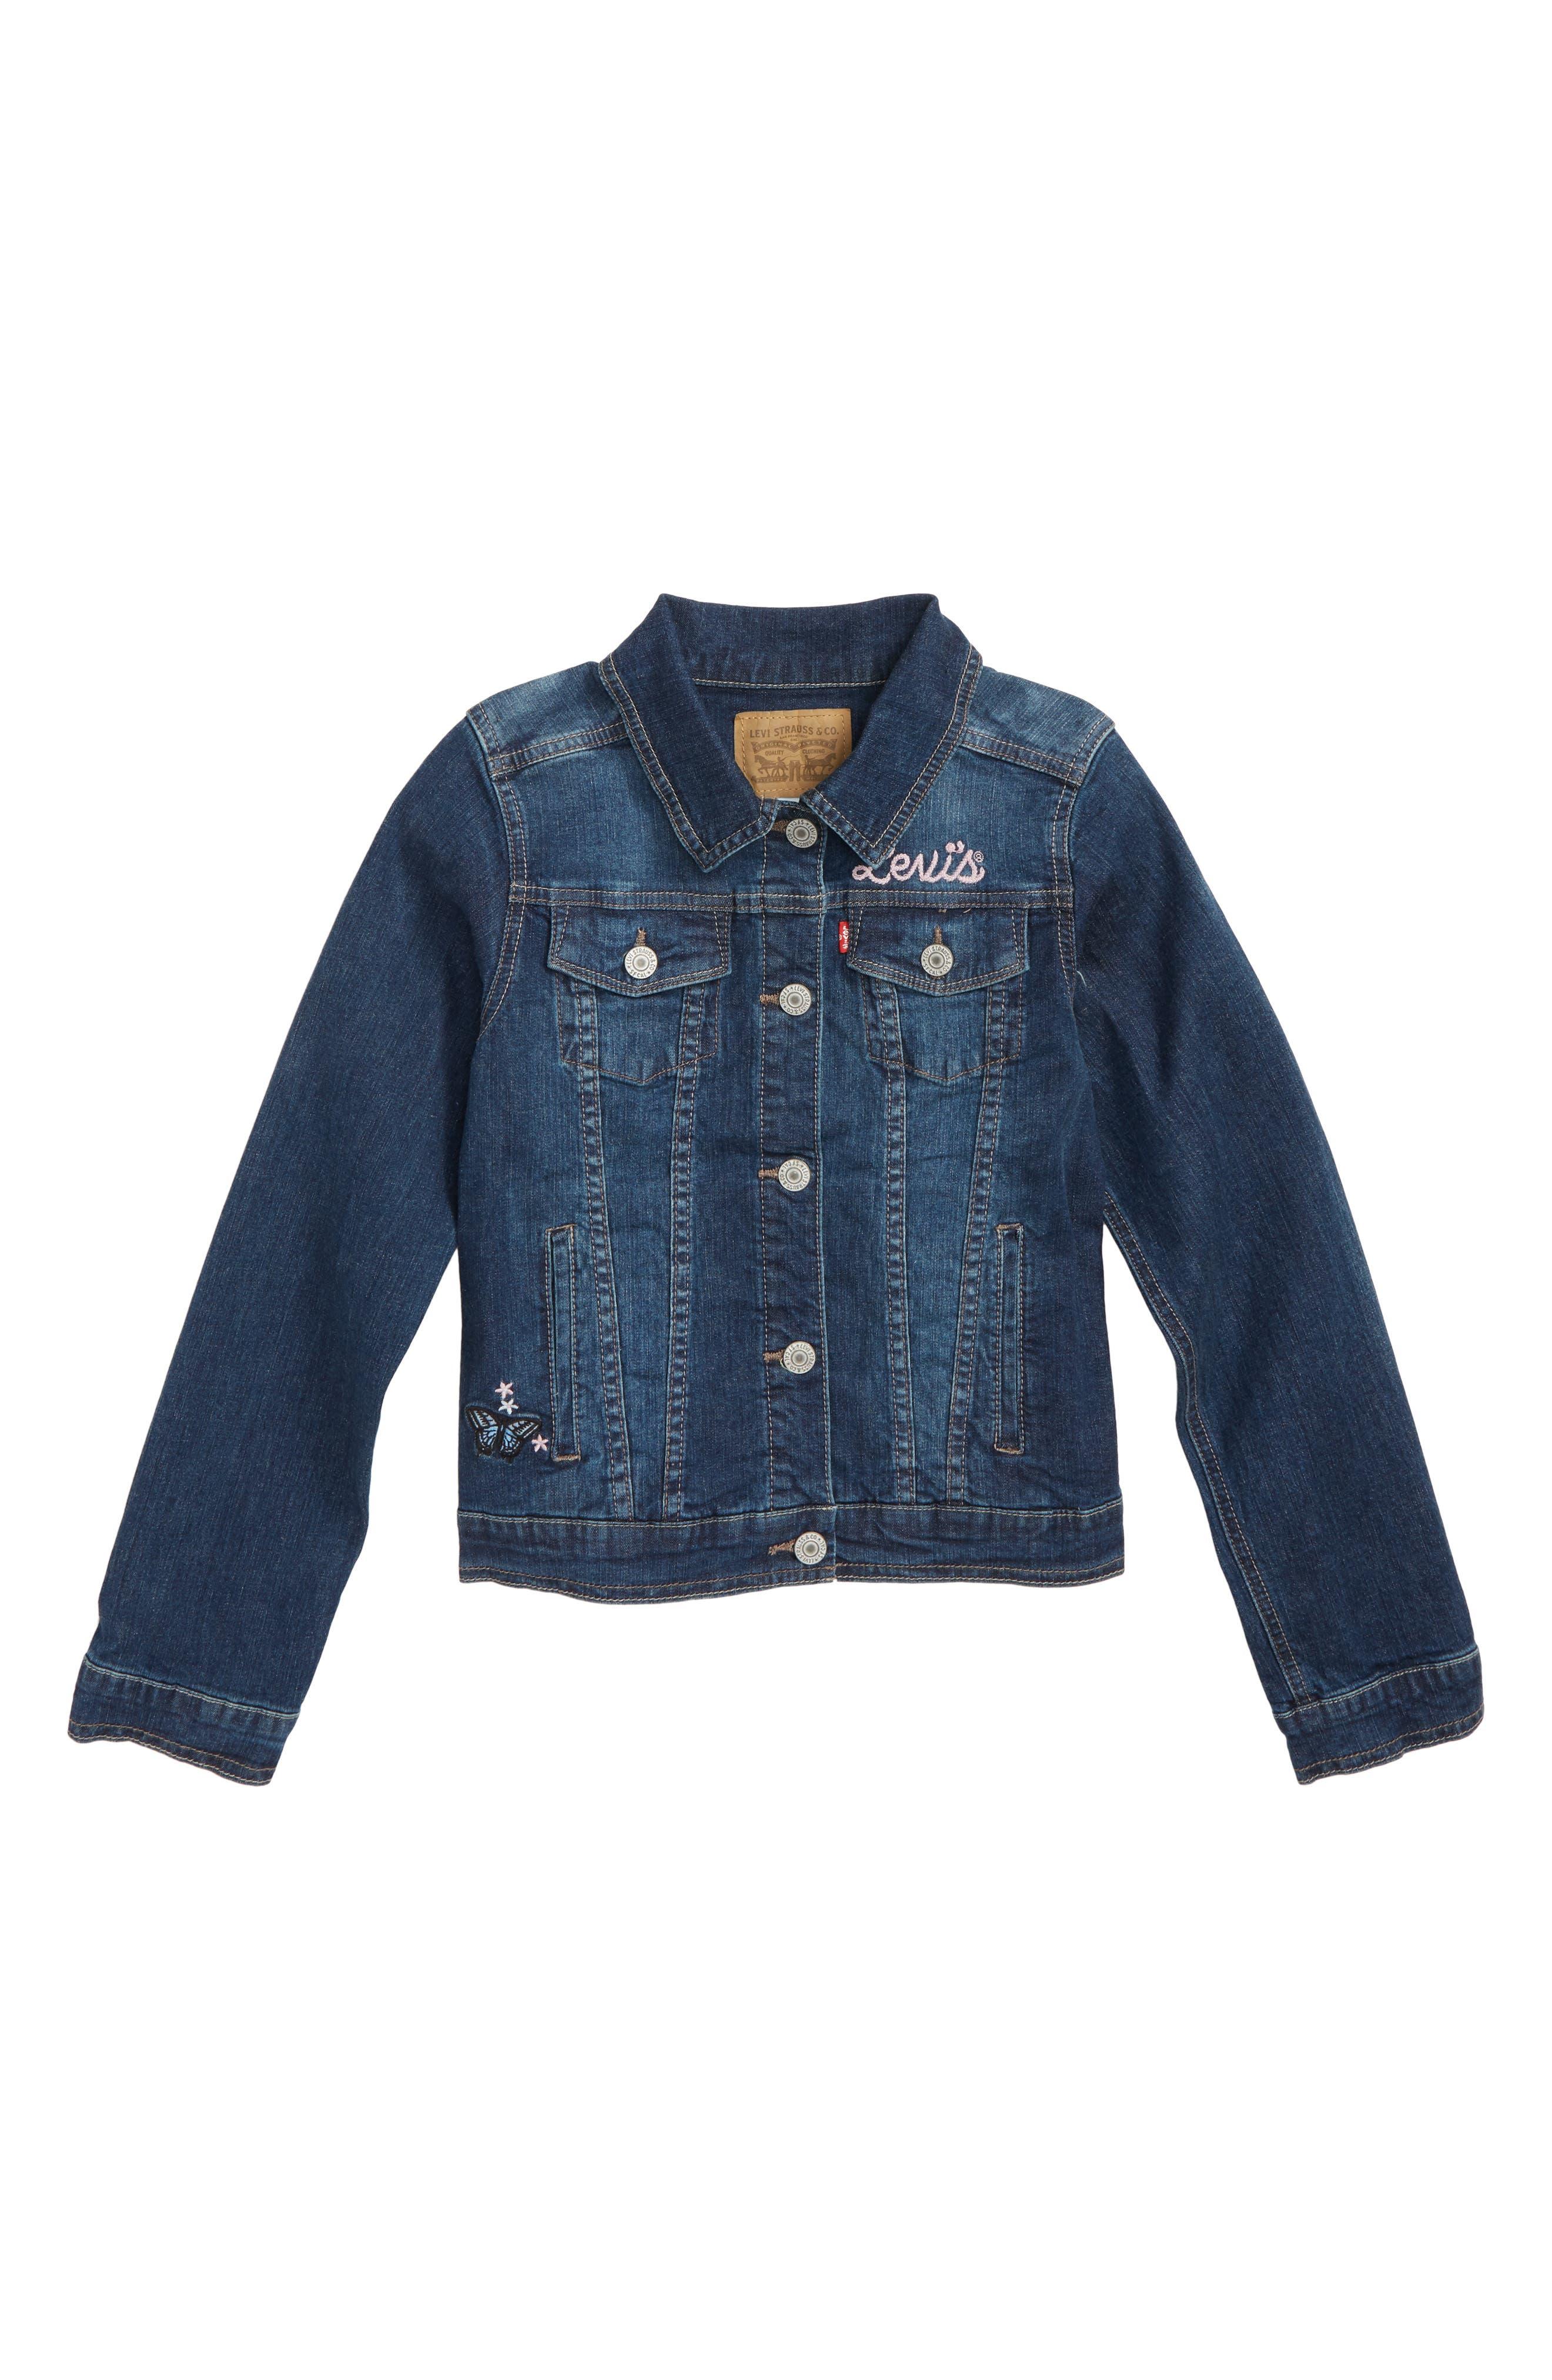 Levi's Denim Trucker Jacket,                         Main,                         color, ROCKABILLY